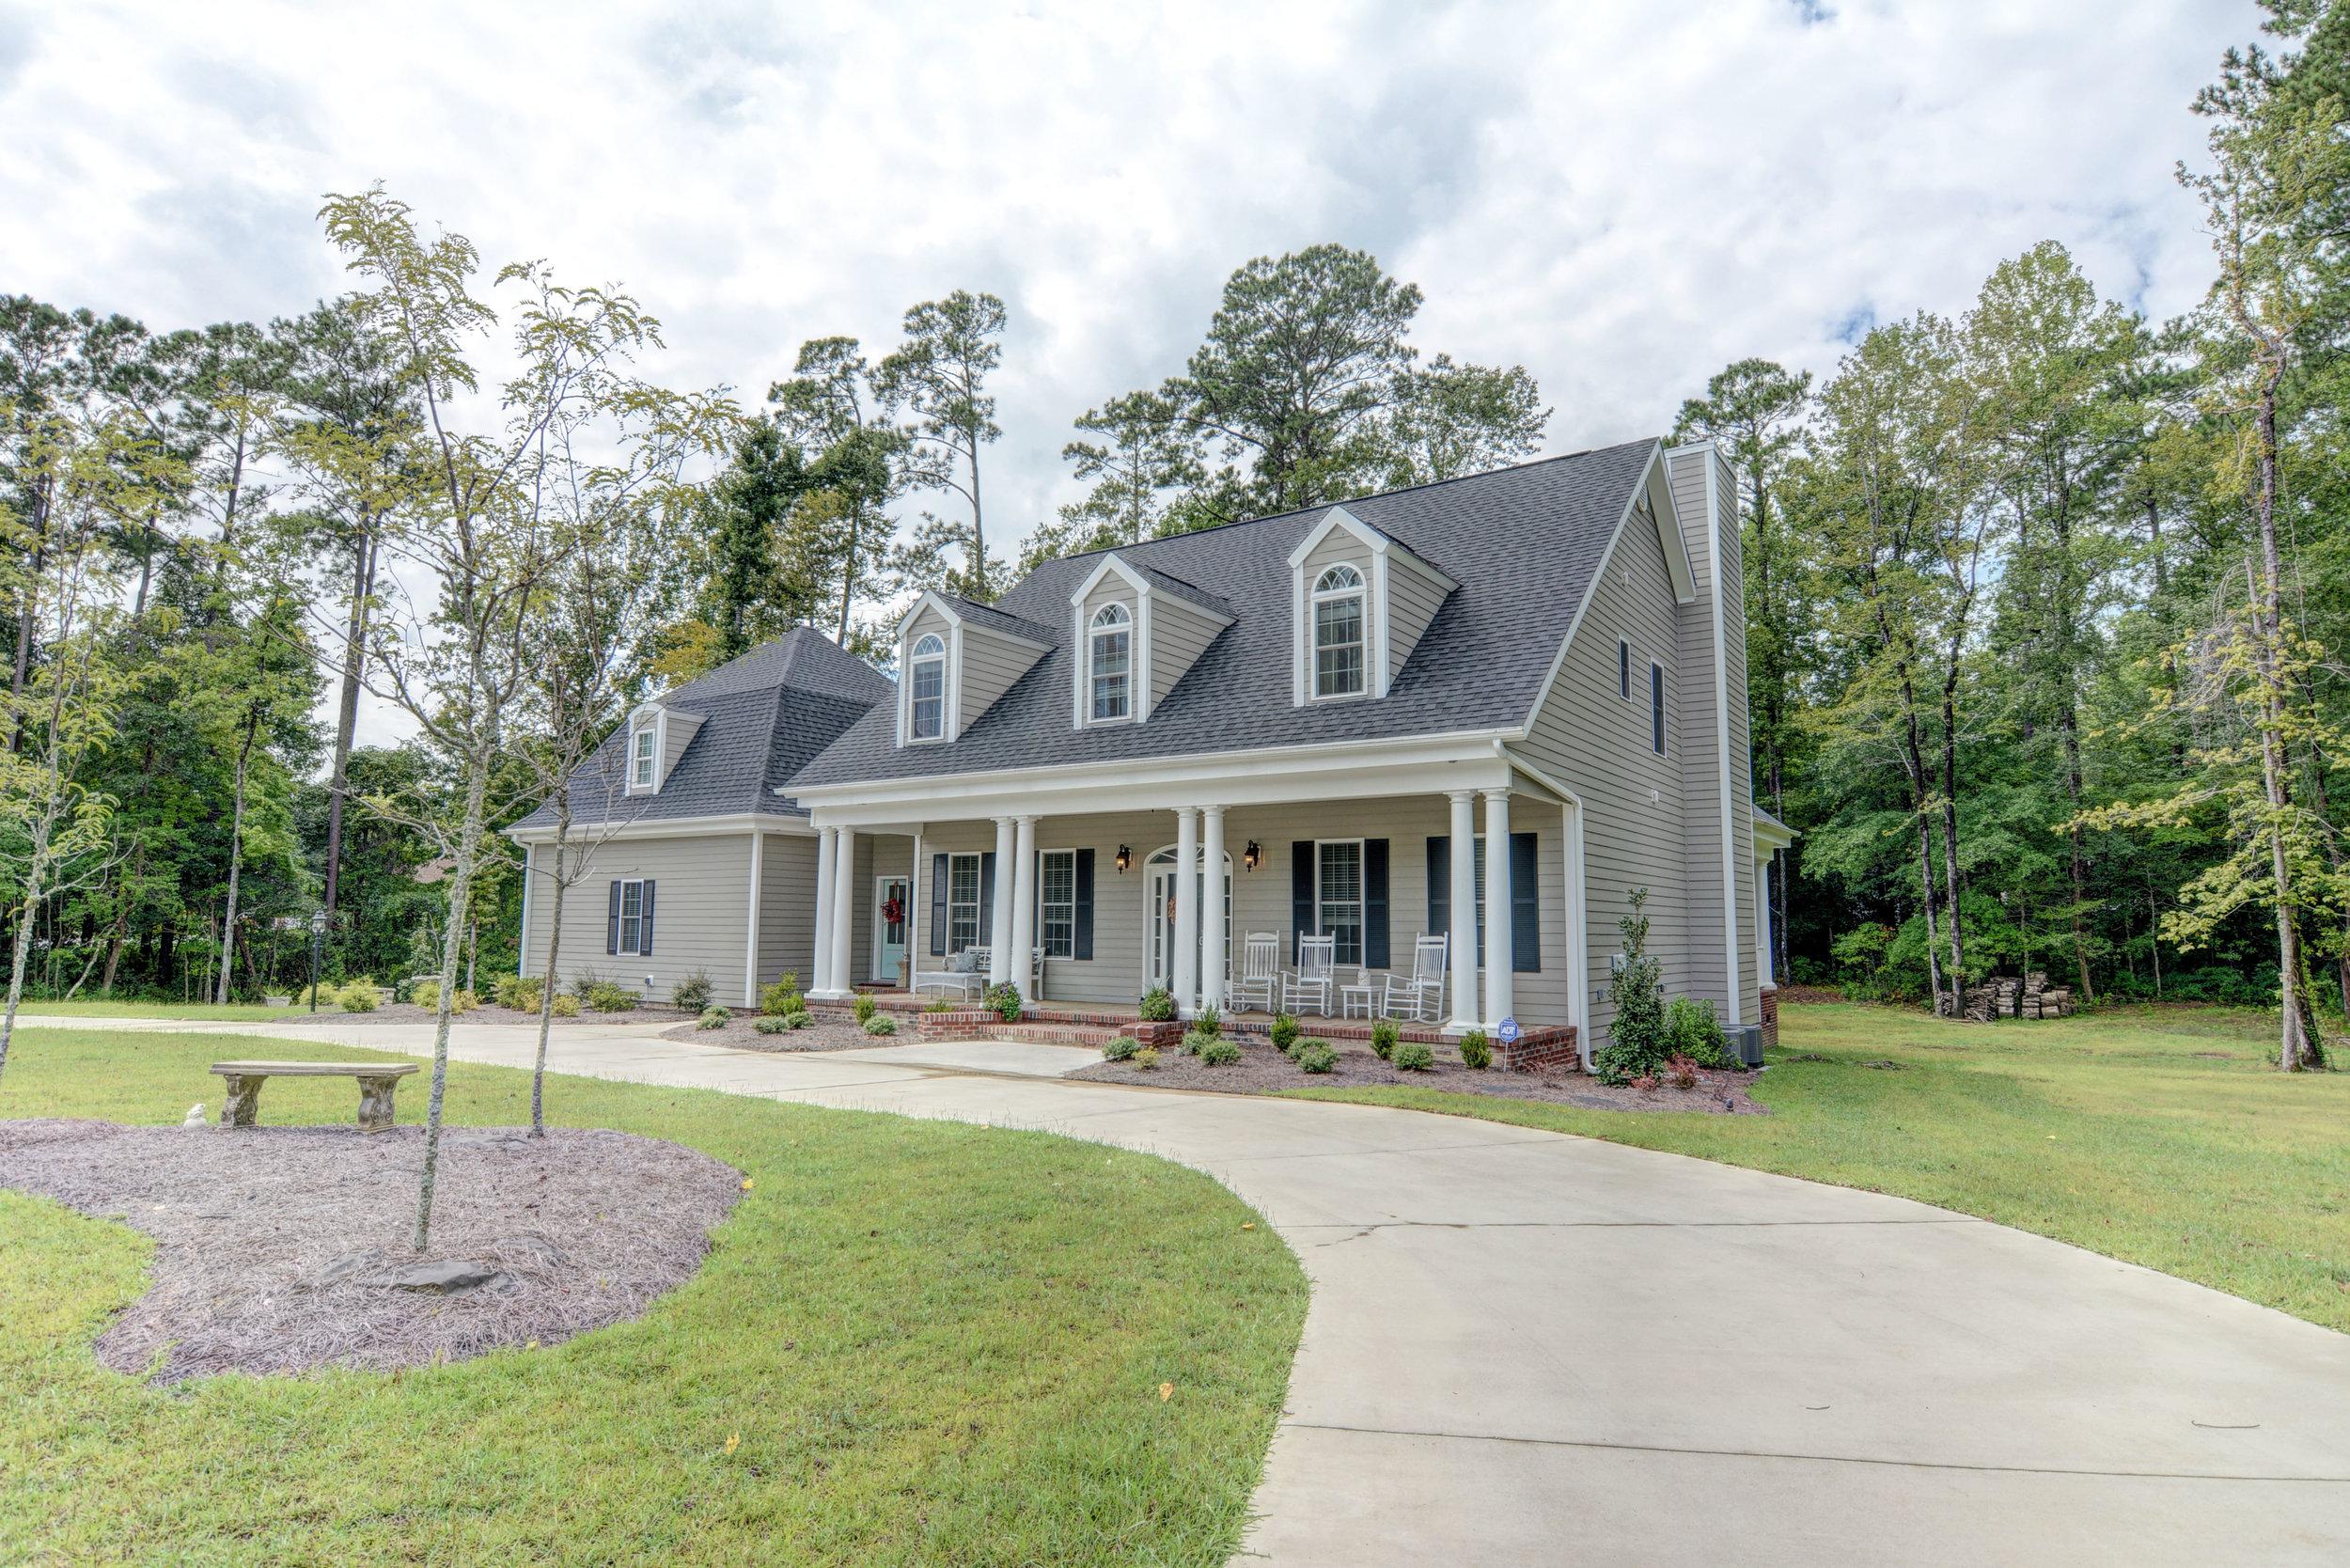 326 Creedmoor Rd Jacksonville-print-006-45-DSC 1270 1 2-4200x2802-300dpi.jpg